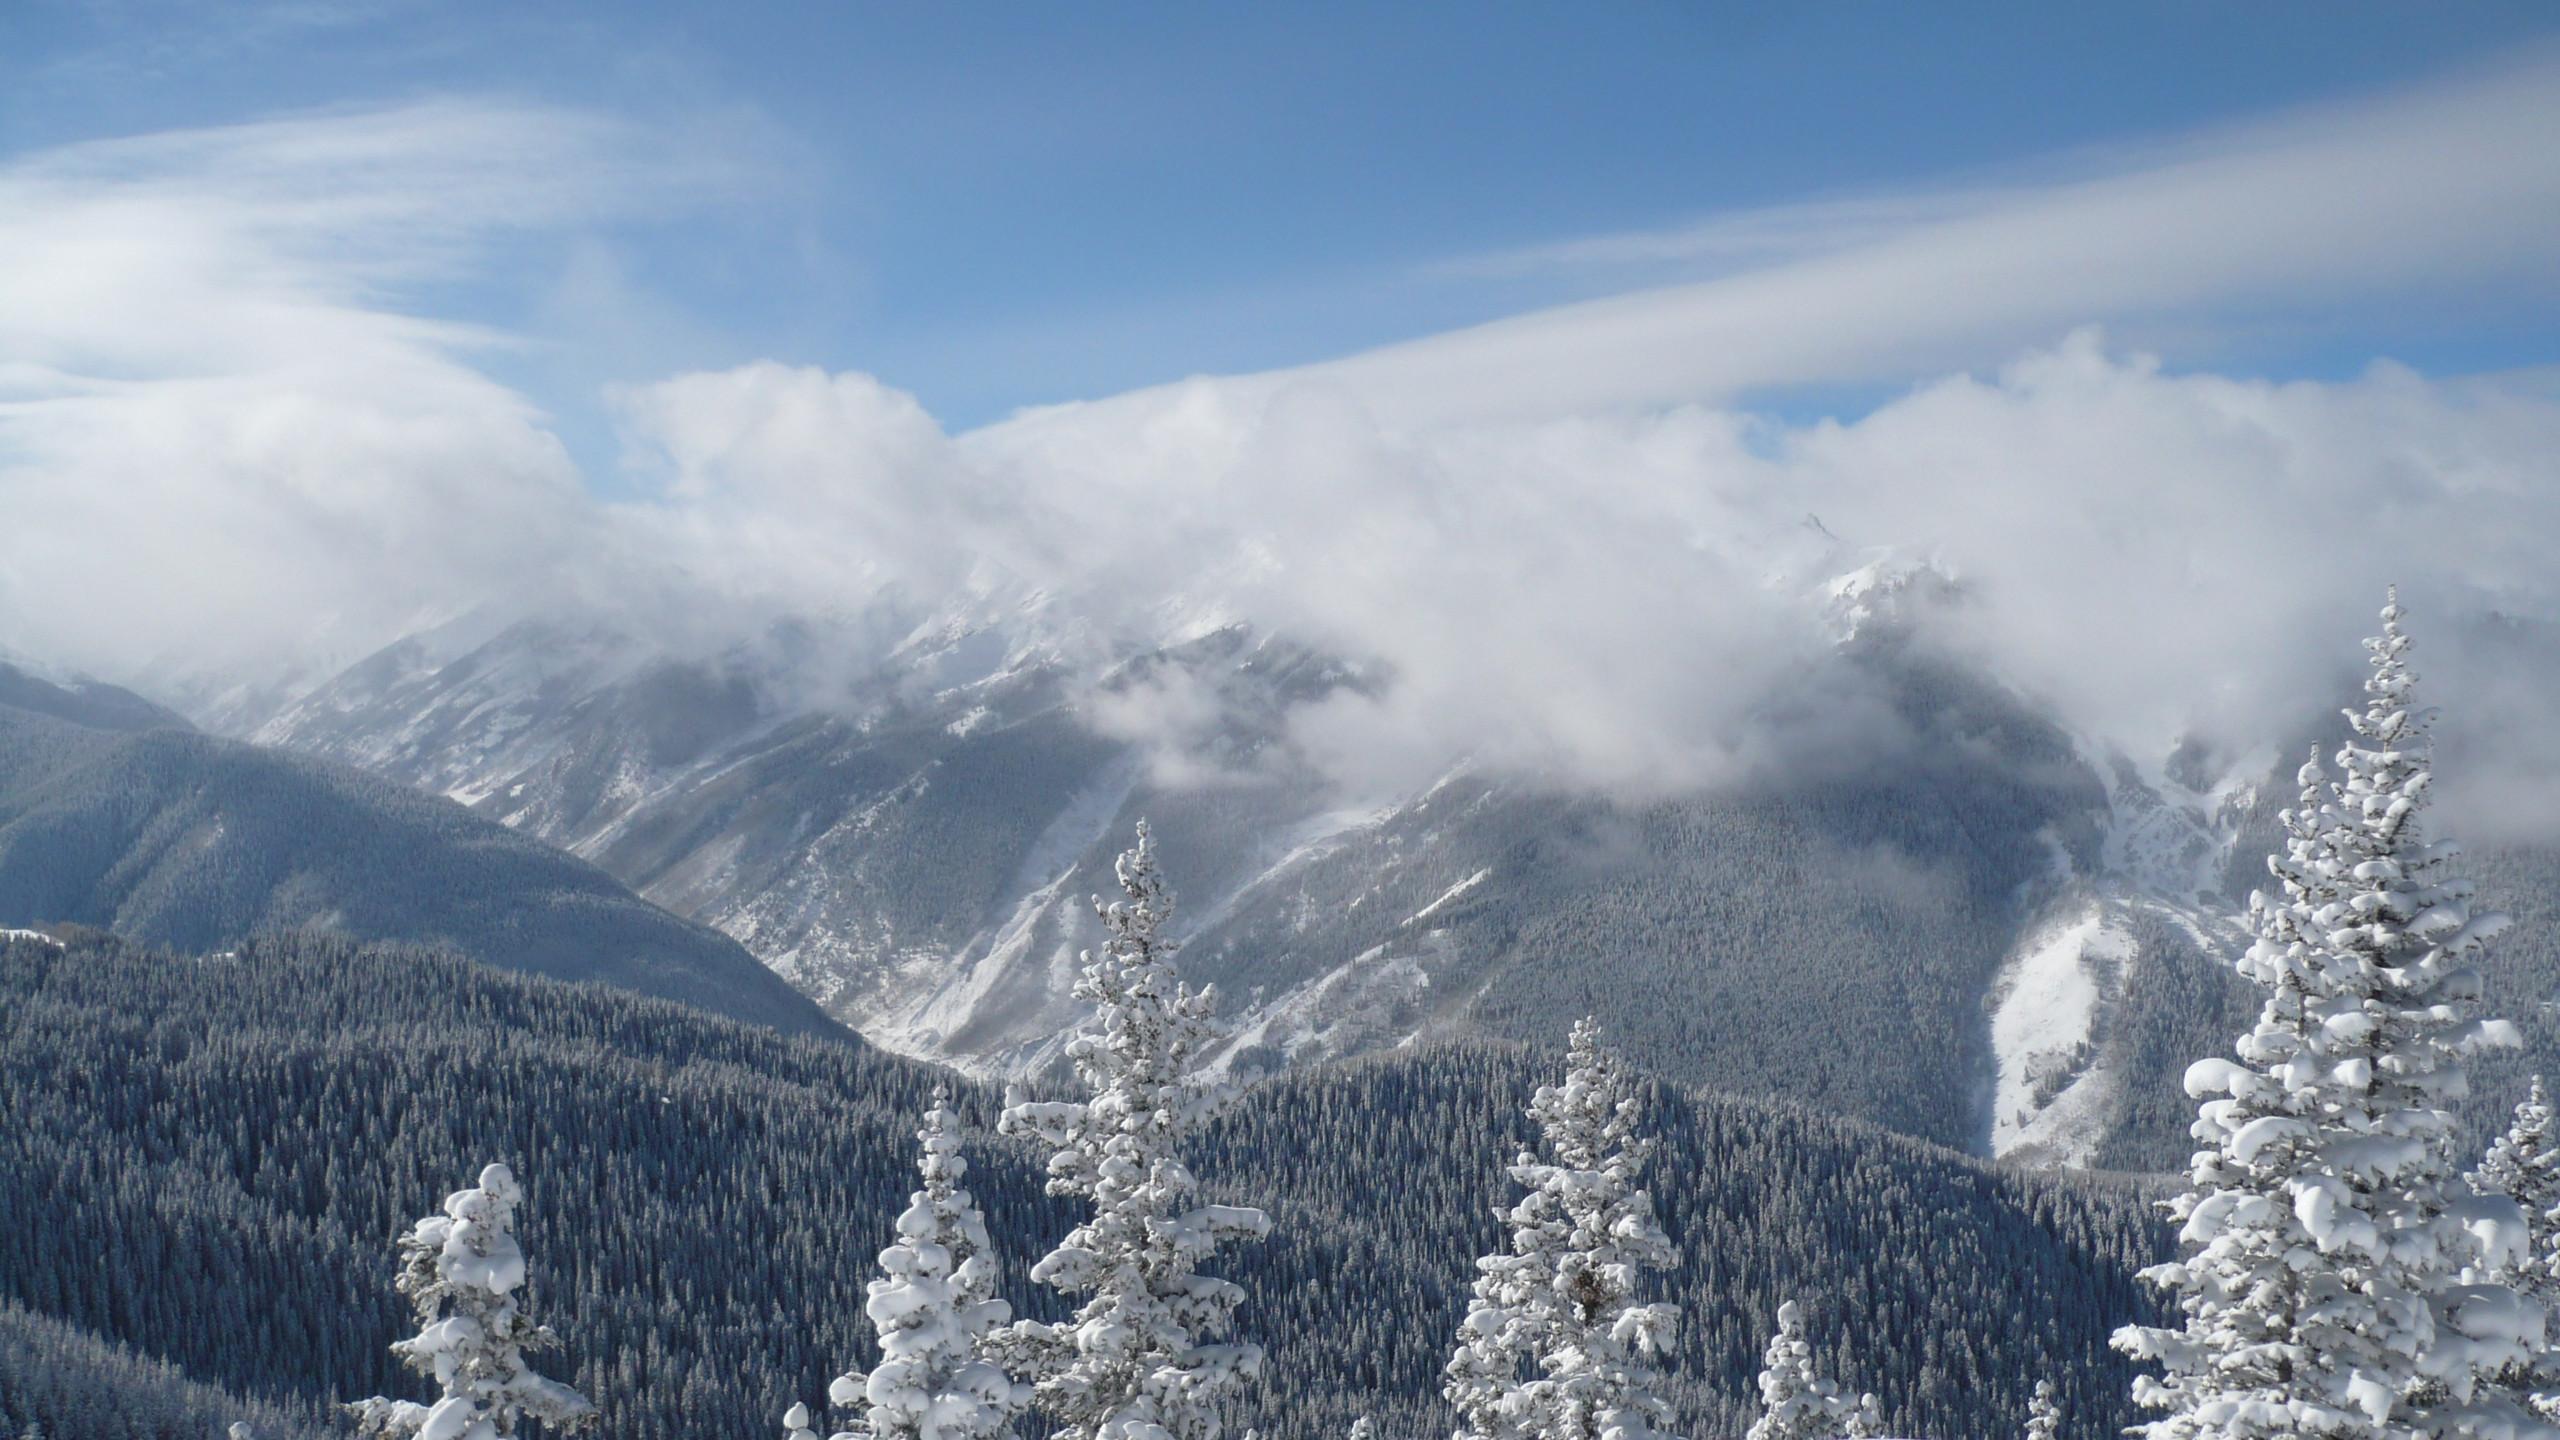 BOT] Best skiing backdrop Snowmass CO WQHD Wallpaper 2560x1440